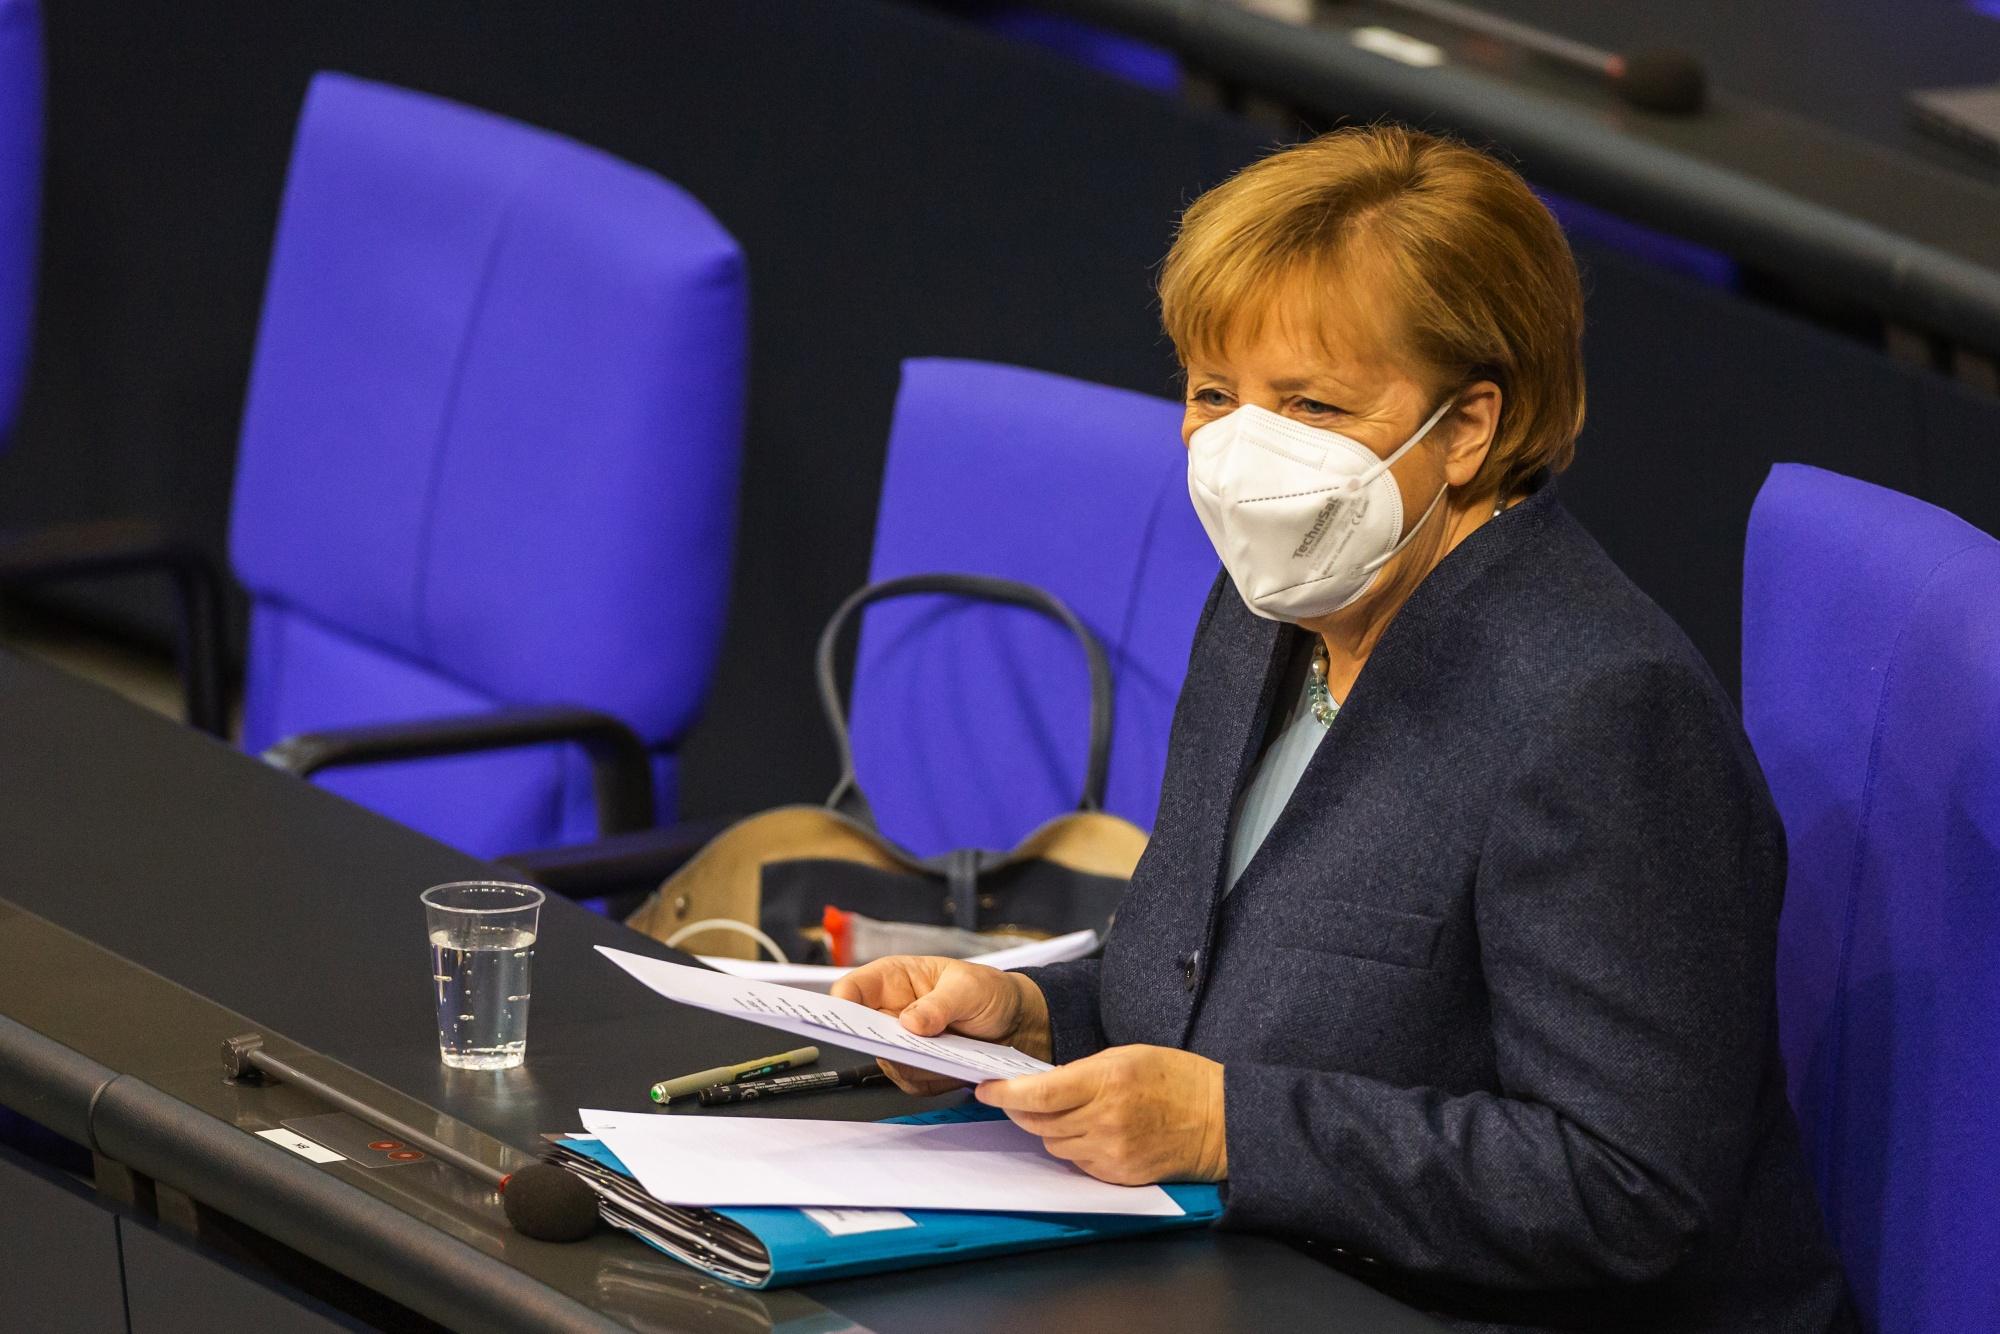 Chancellor Merkel Addresses Bundestag As Germany Considers Lockdown Extension